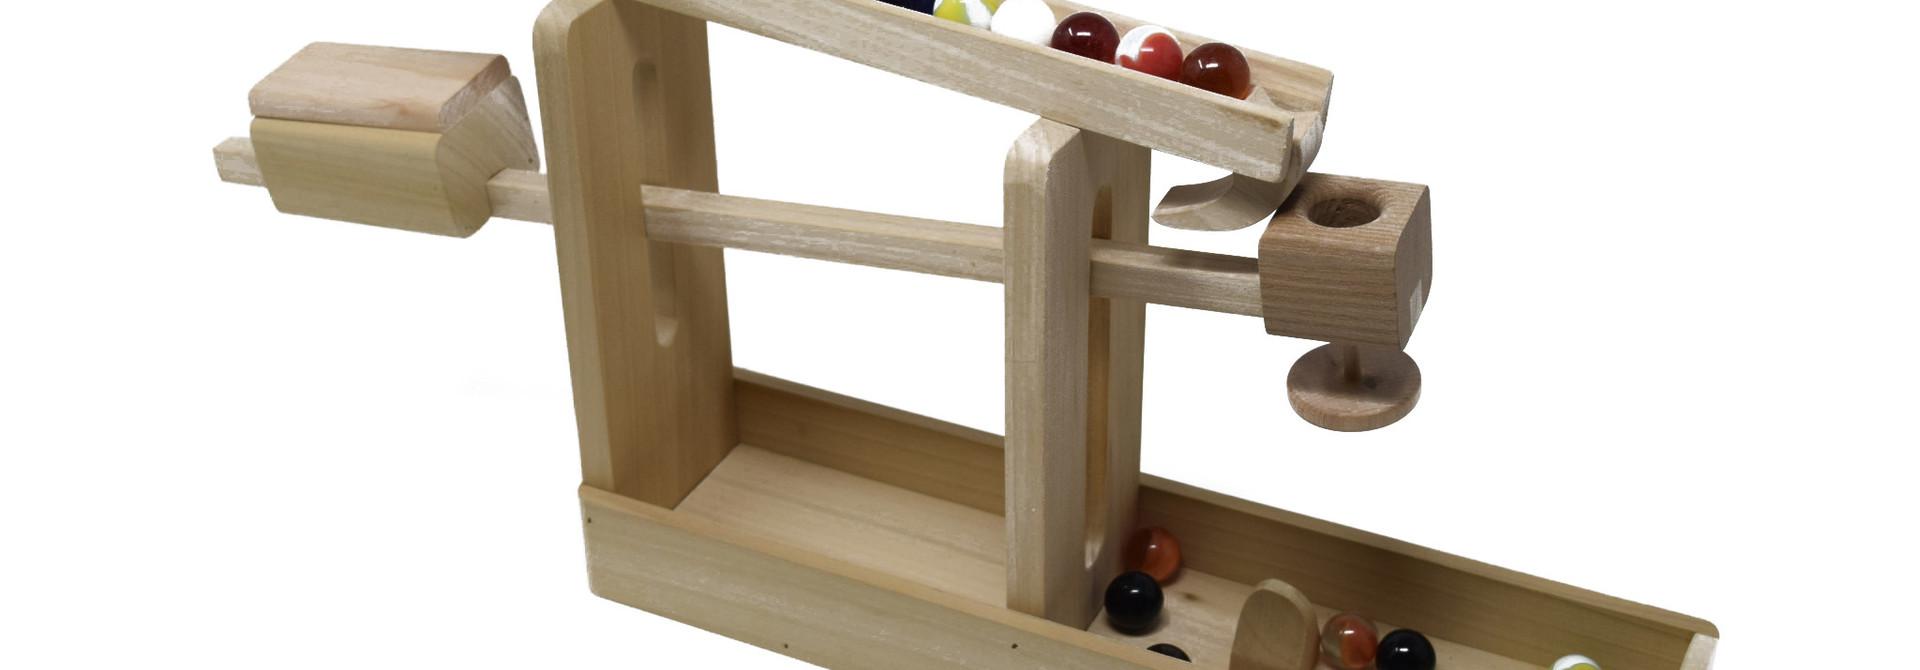 Wooden Marble Roller Machine Toy